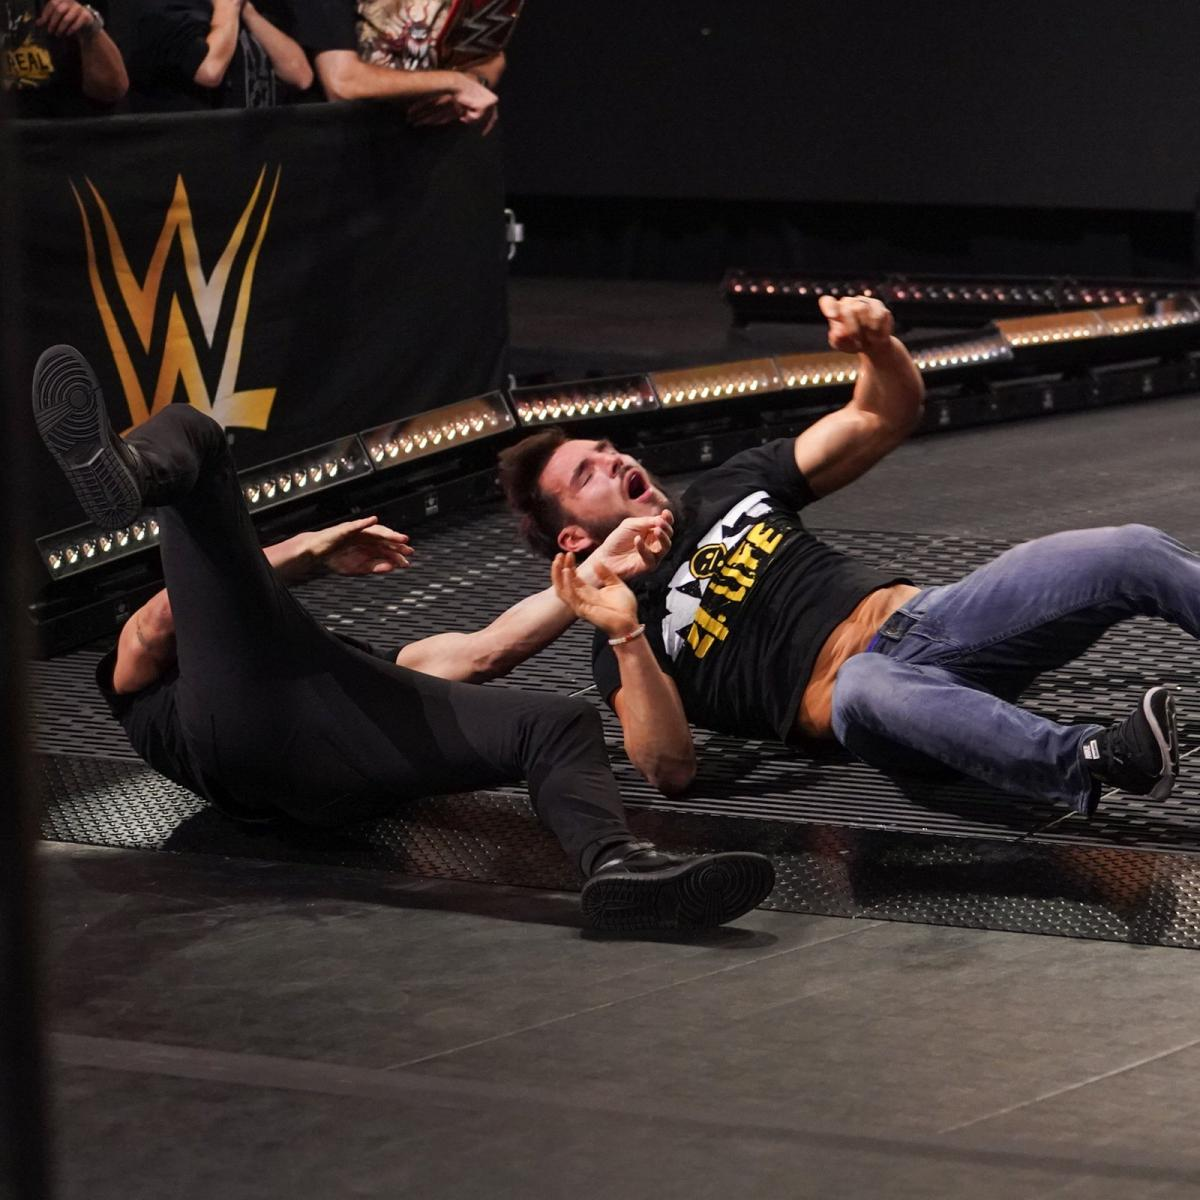 NXT Johnny Gargano